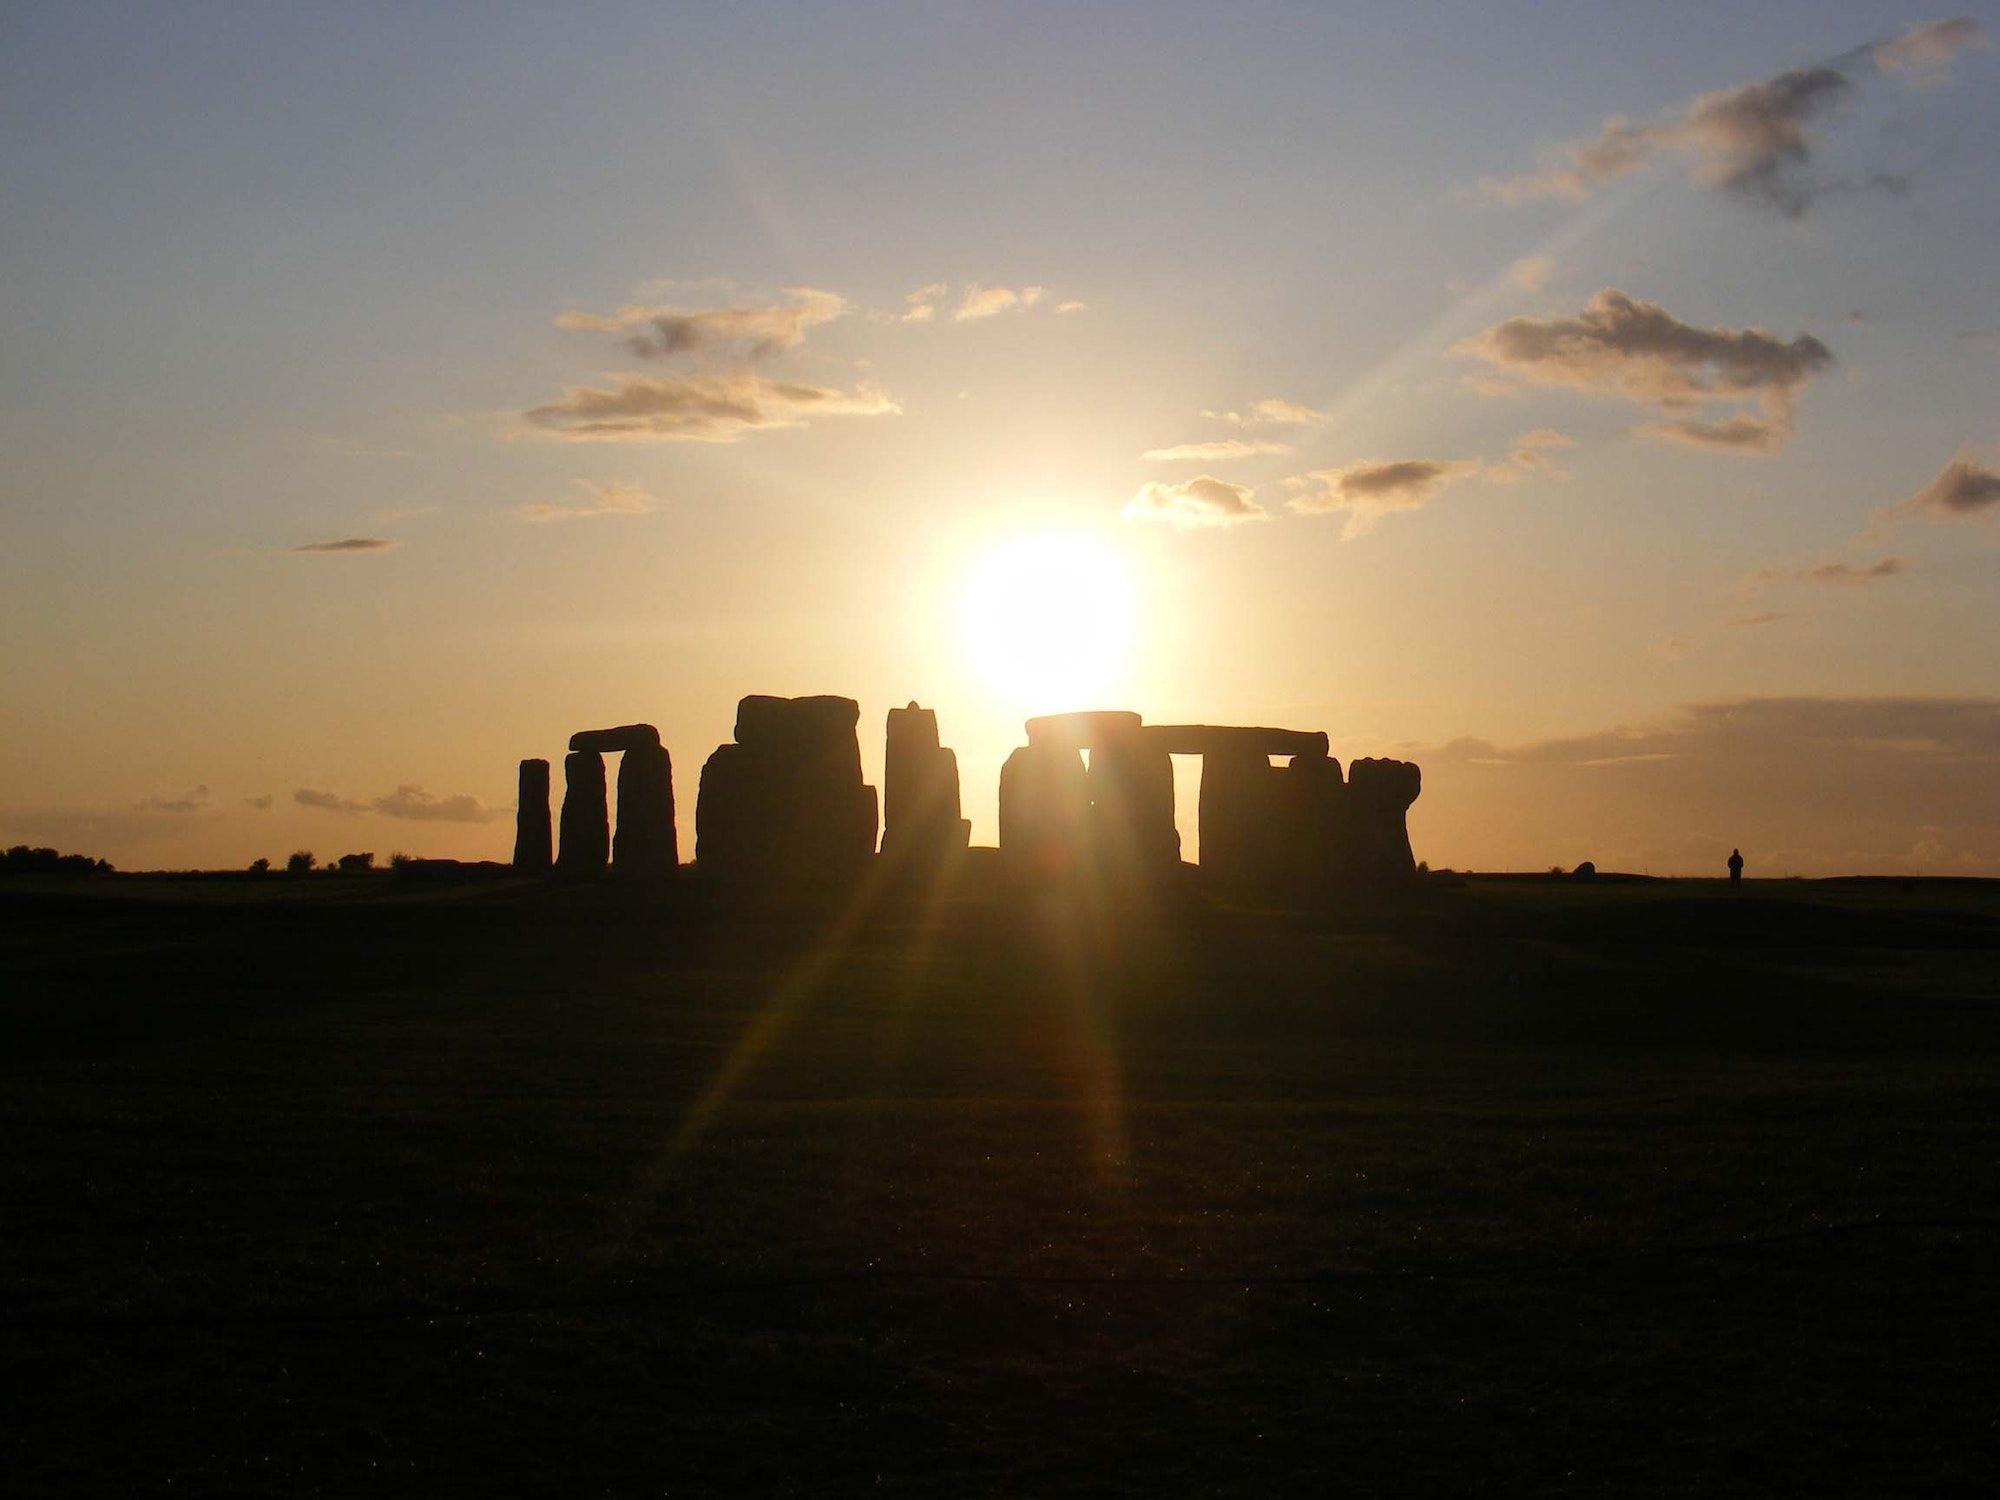 stonehenge is set to livestream its 2020 summer solstice